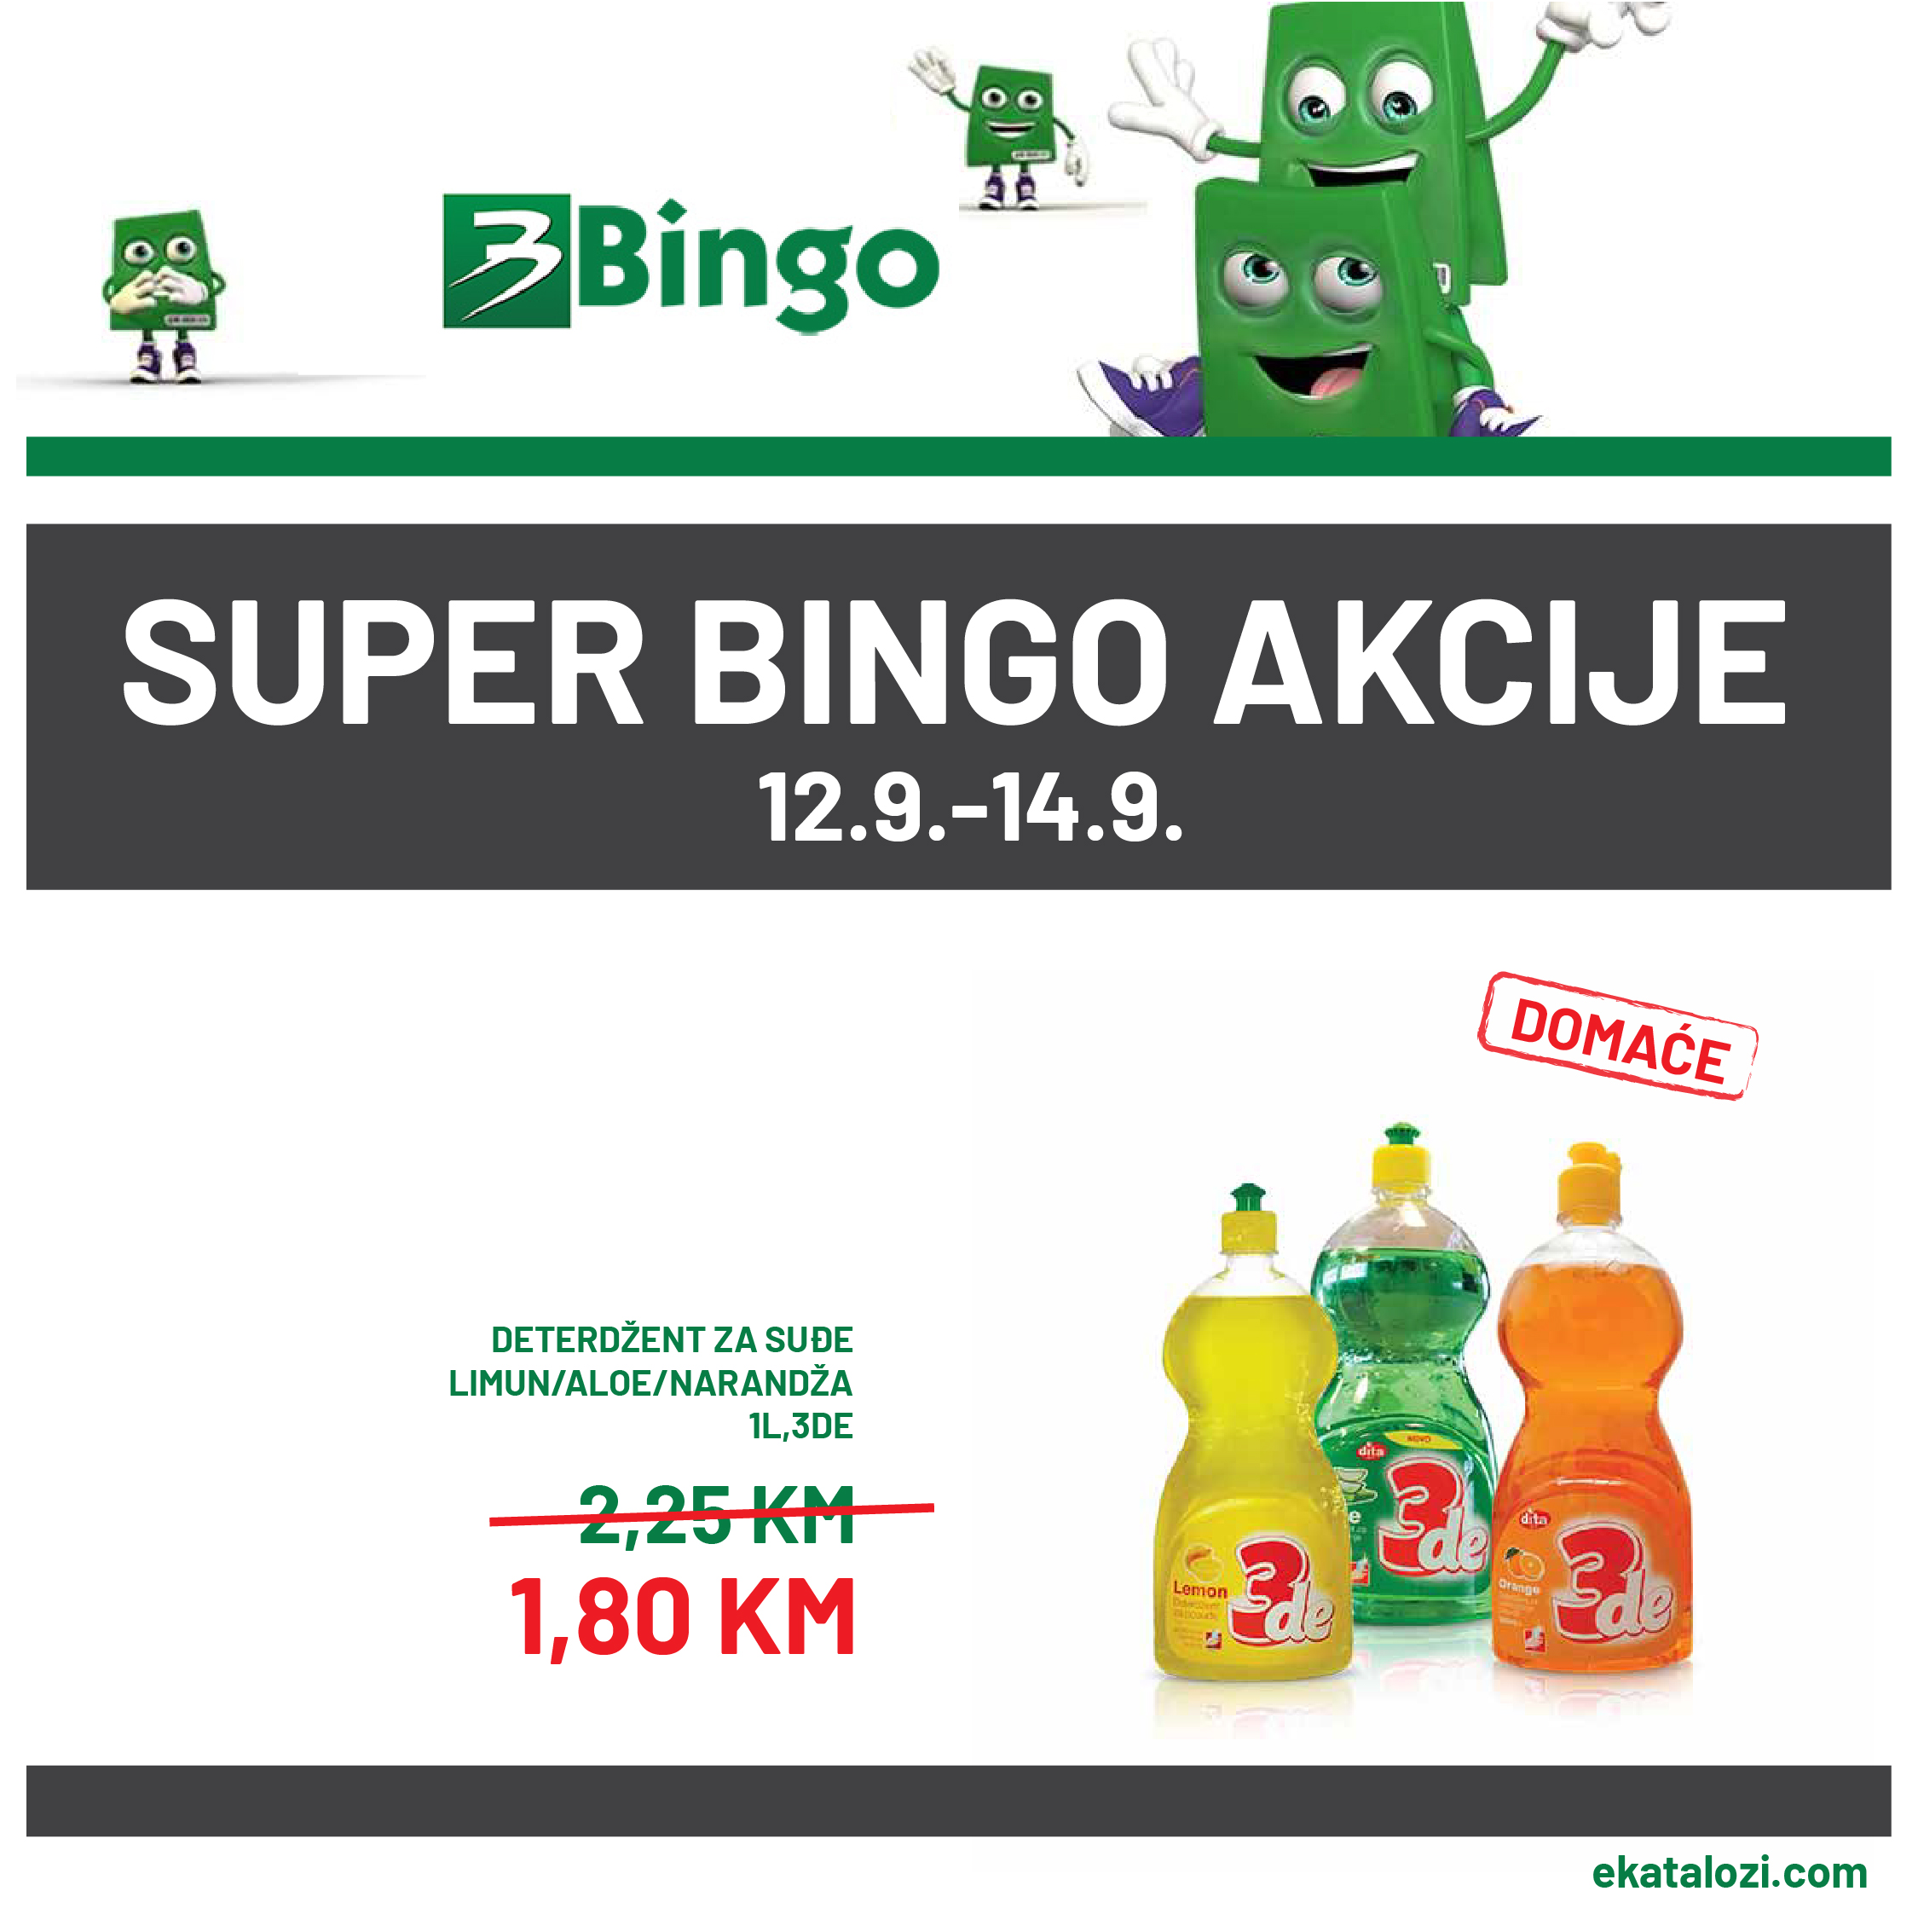 BINGO Akcija SEPTEMBAR 2021 12.9.2021. 14.9.2021 1 1